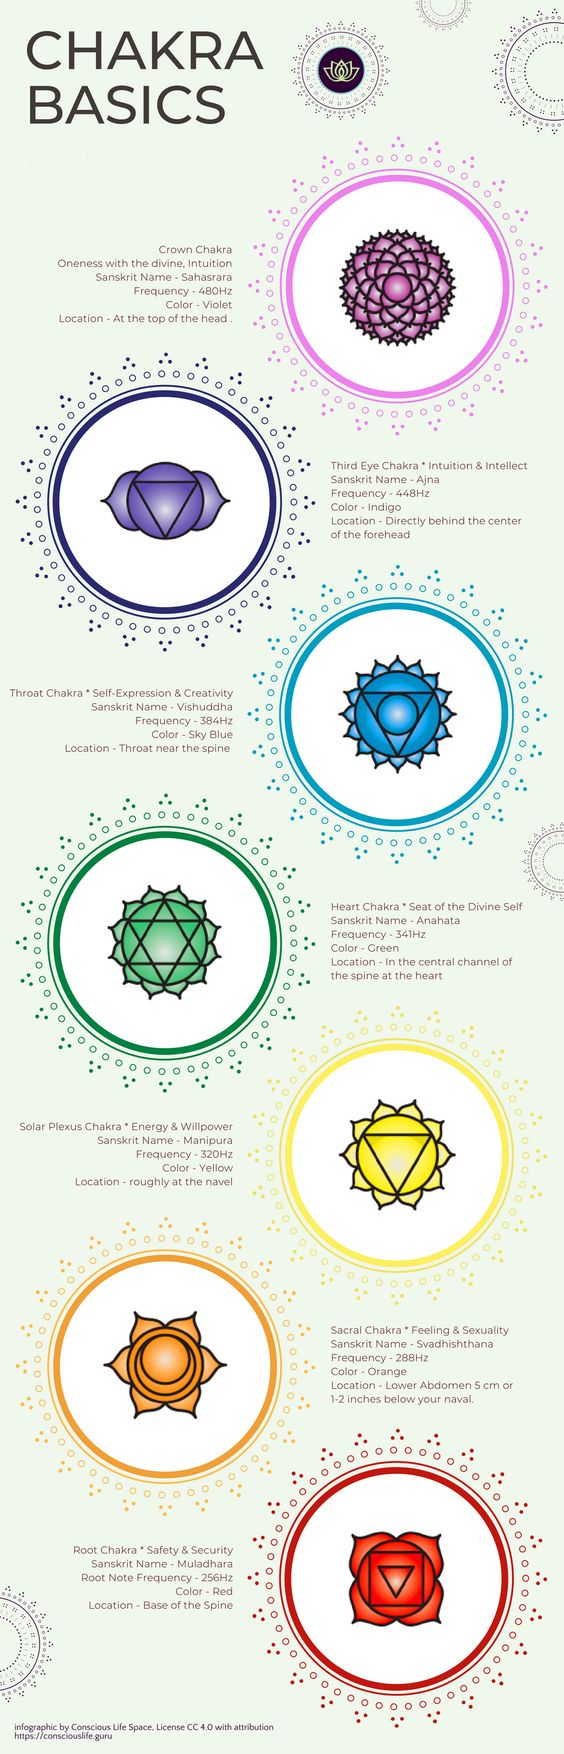 Chakra Basics Infographic